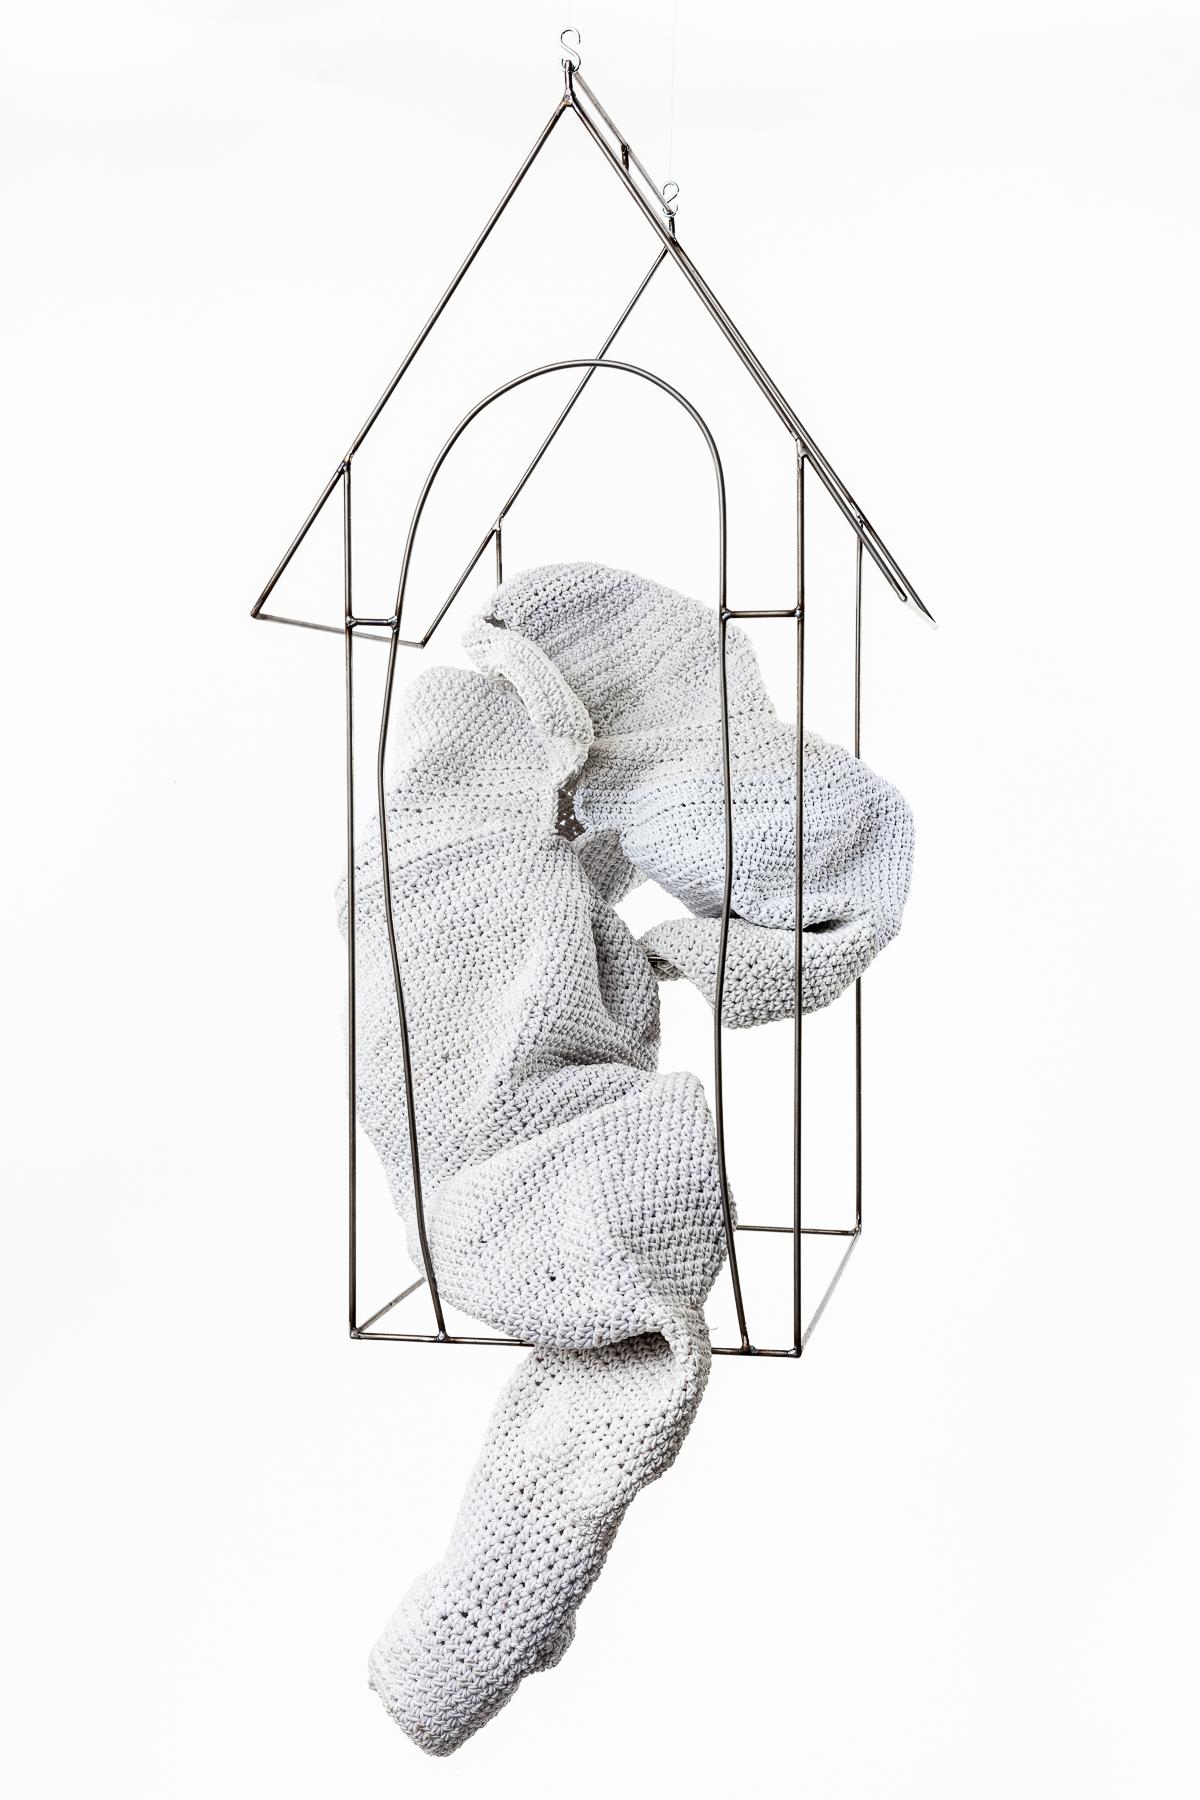 _DS_0187_Claudia-Maria Luenig_Skulpturen_web.jpg